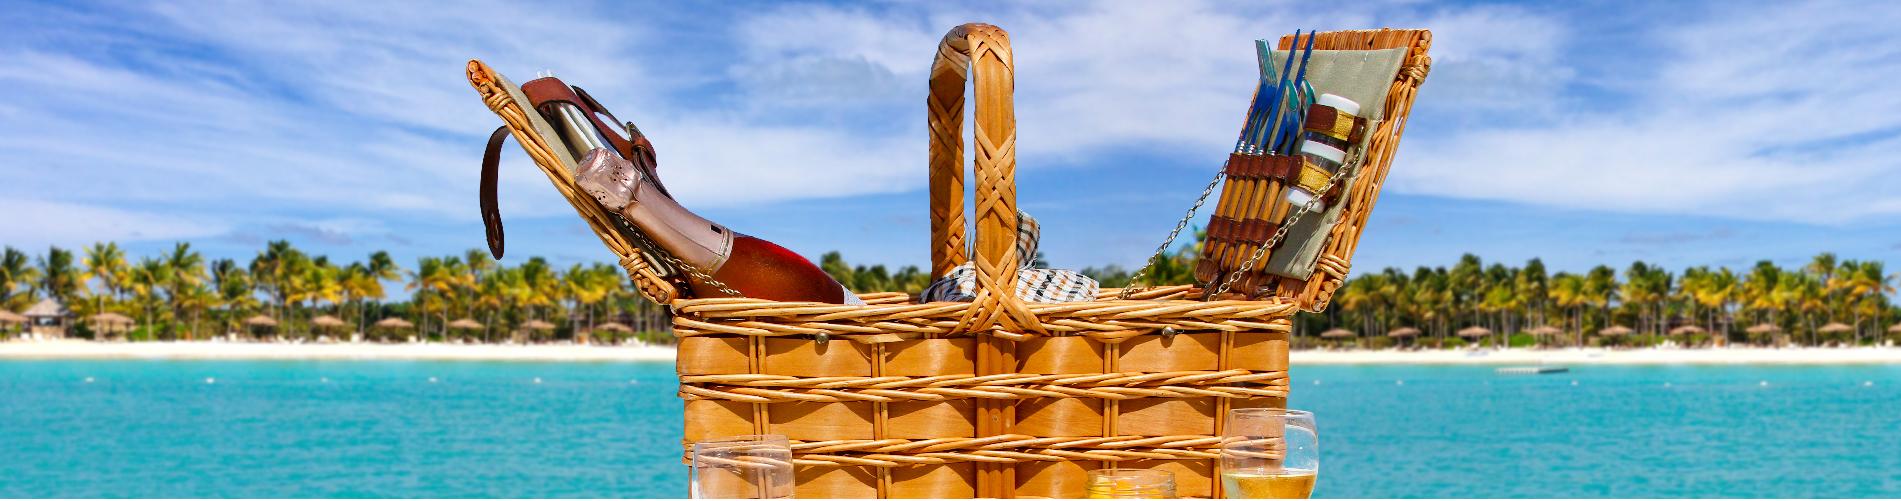 lifes-a-picnic-boat-charter-antigua-02